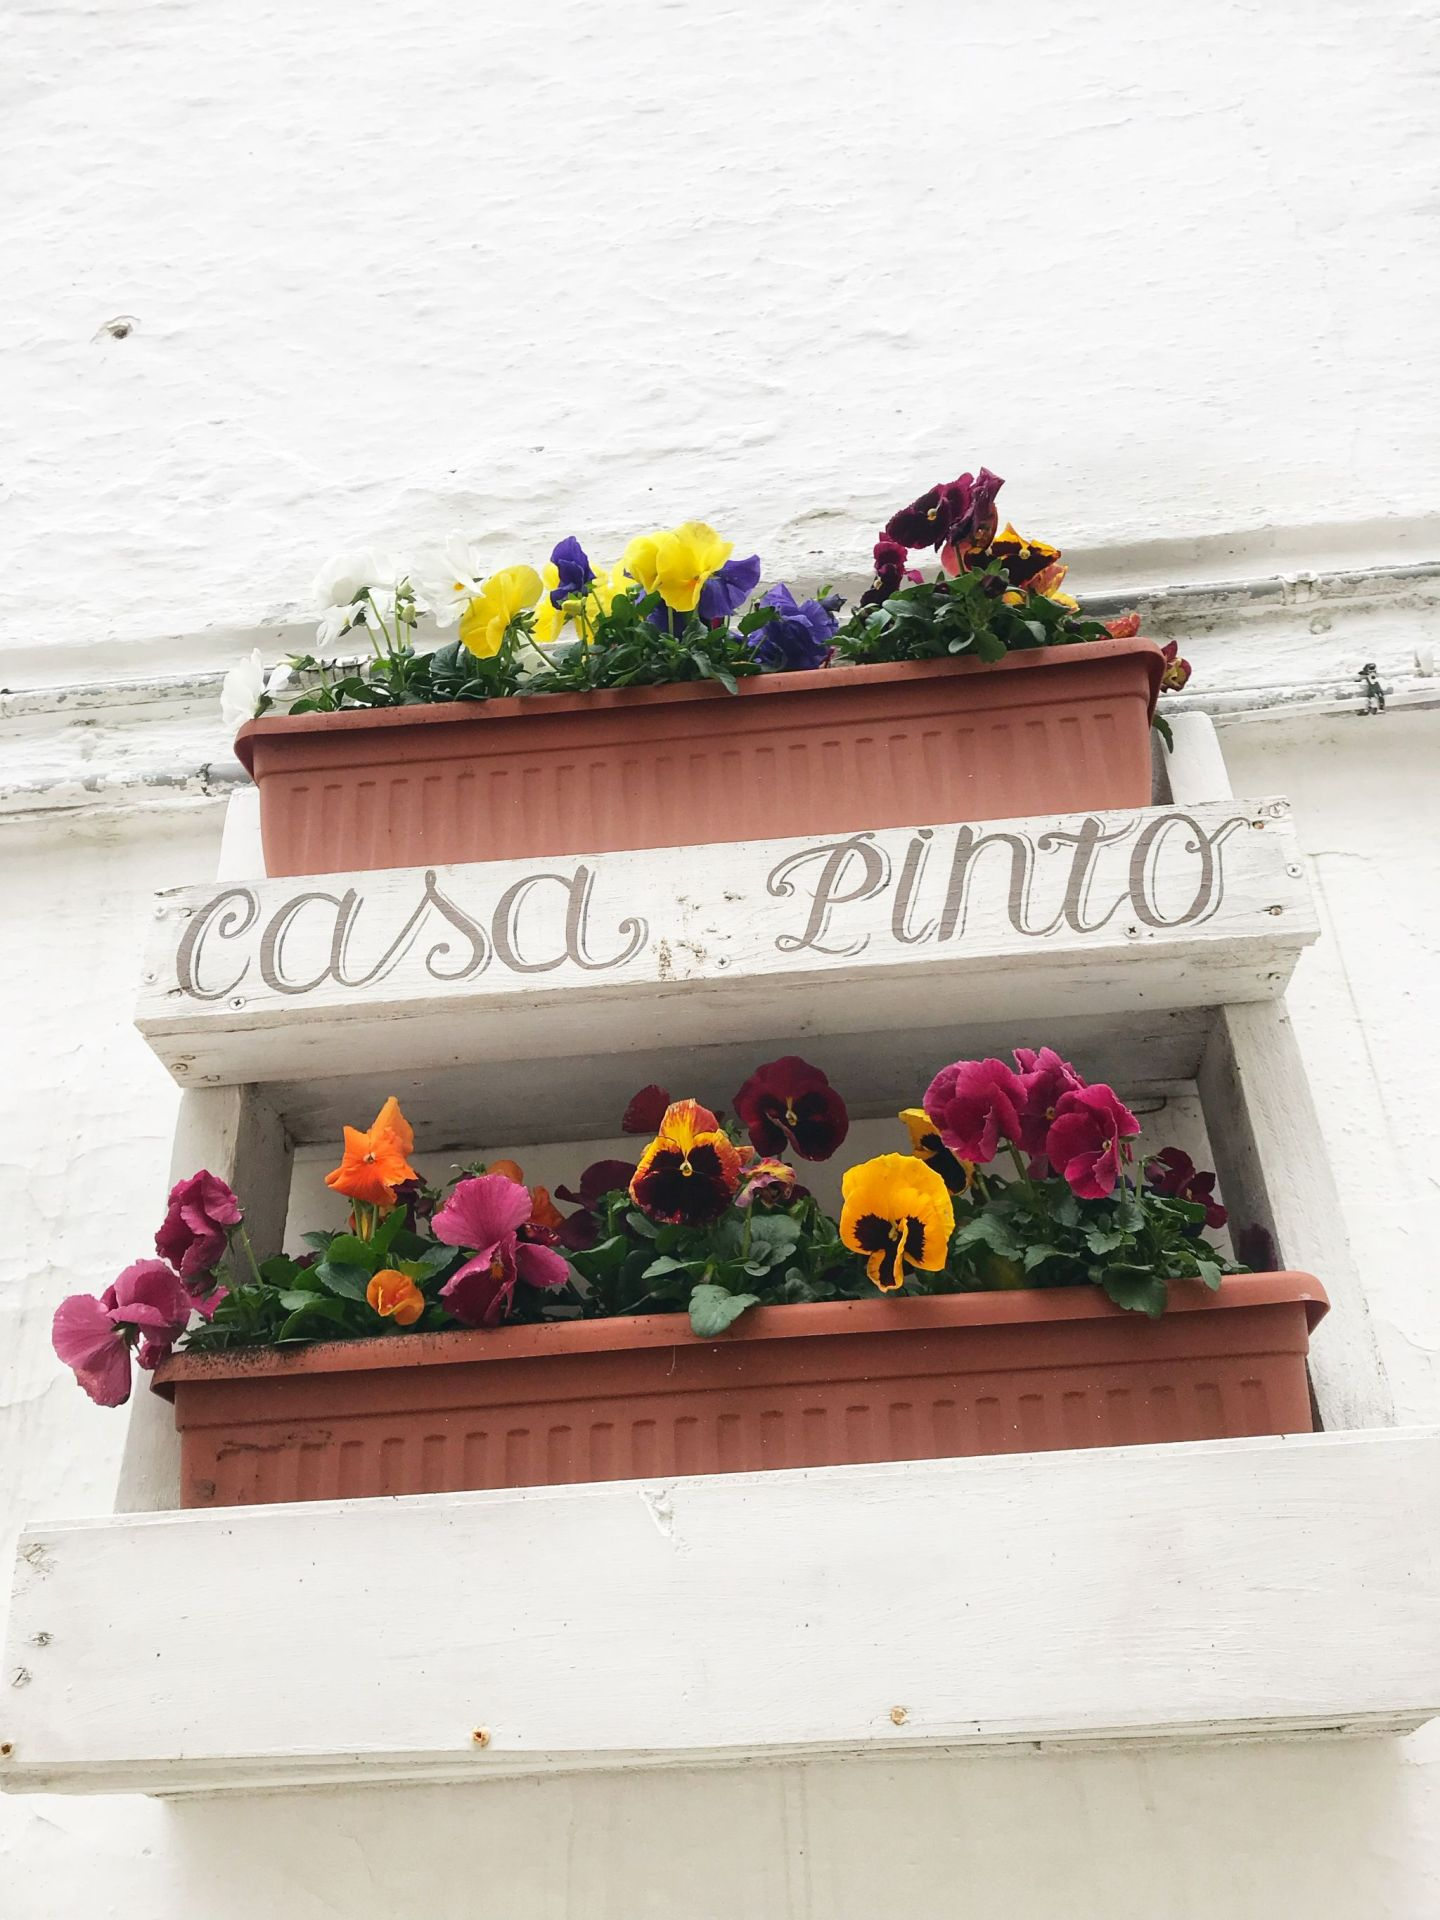 Casa Pinto Pansies window box in Locorotondo